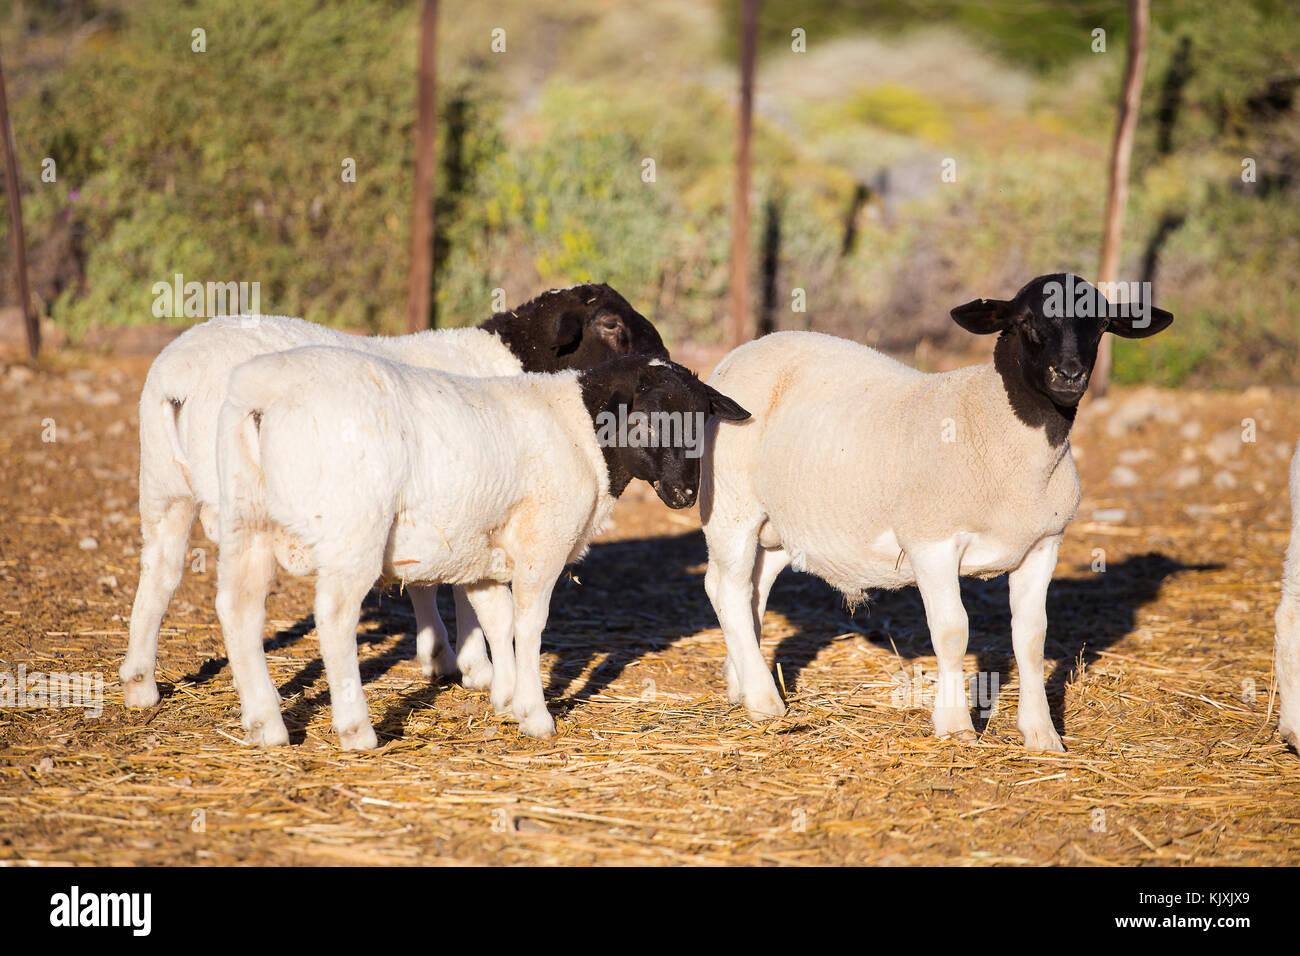 Dorper Sheep Rams on a dorper sheep stud farm in the Tankwa karoo in South Africa - Stock Image